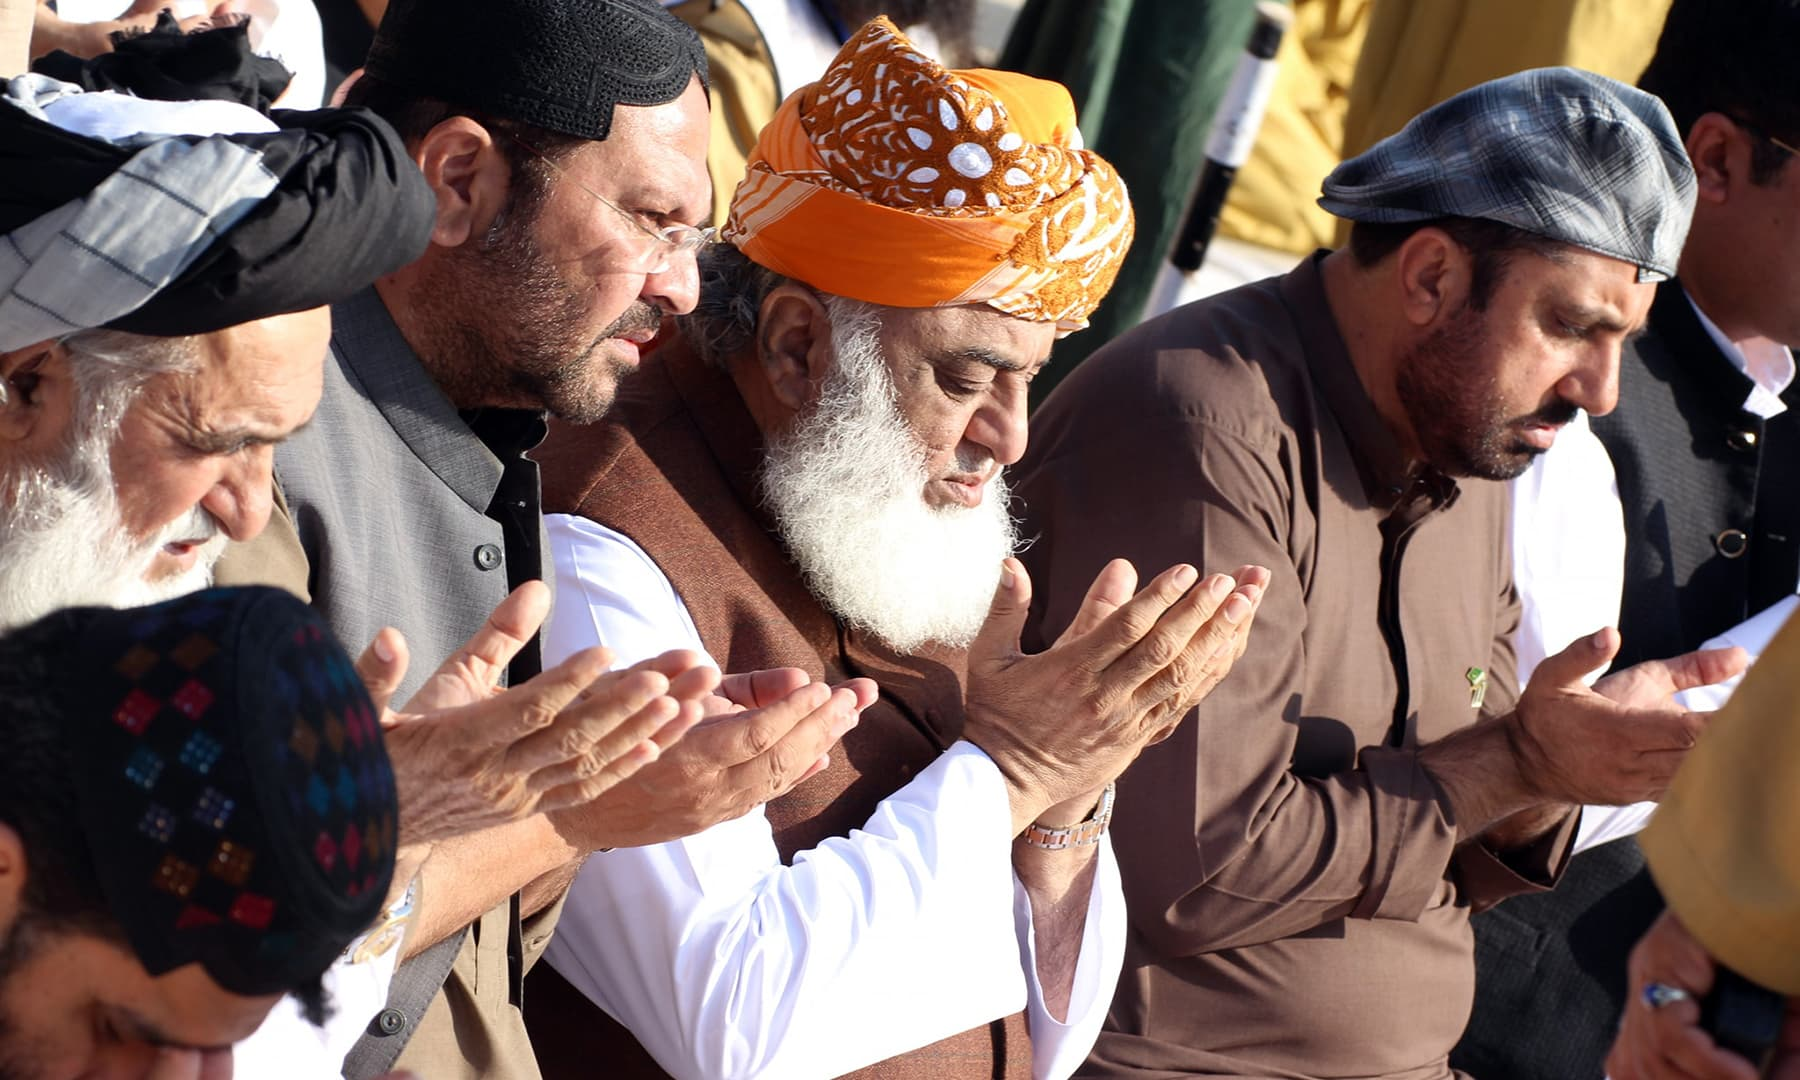 Photos courtesy Jamiat Ulama-e-Islam Pakistan Facebook page